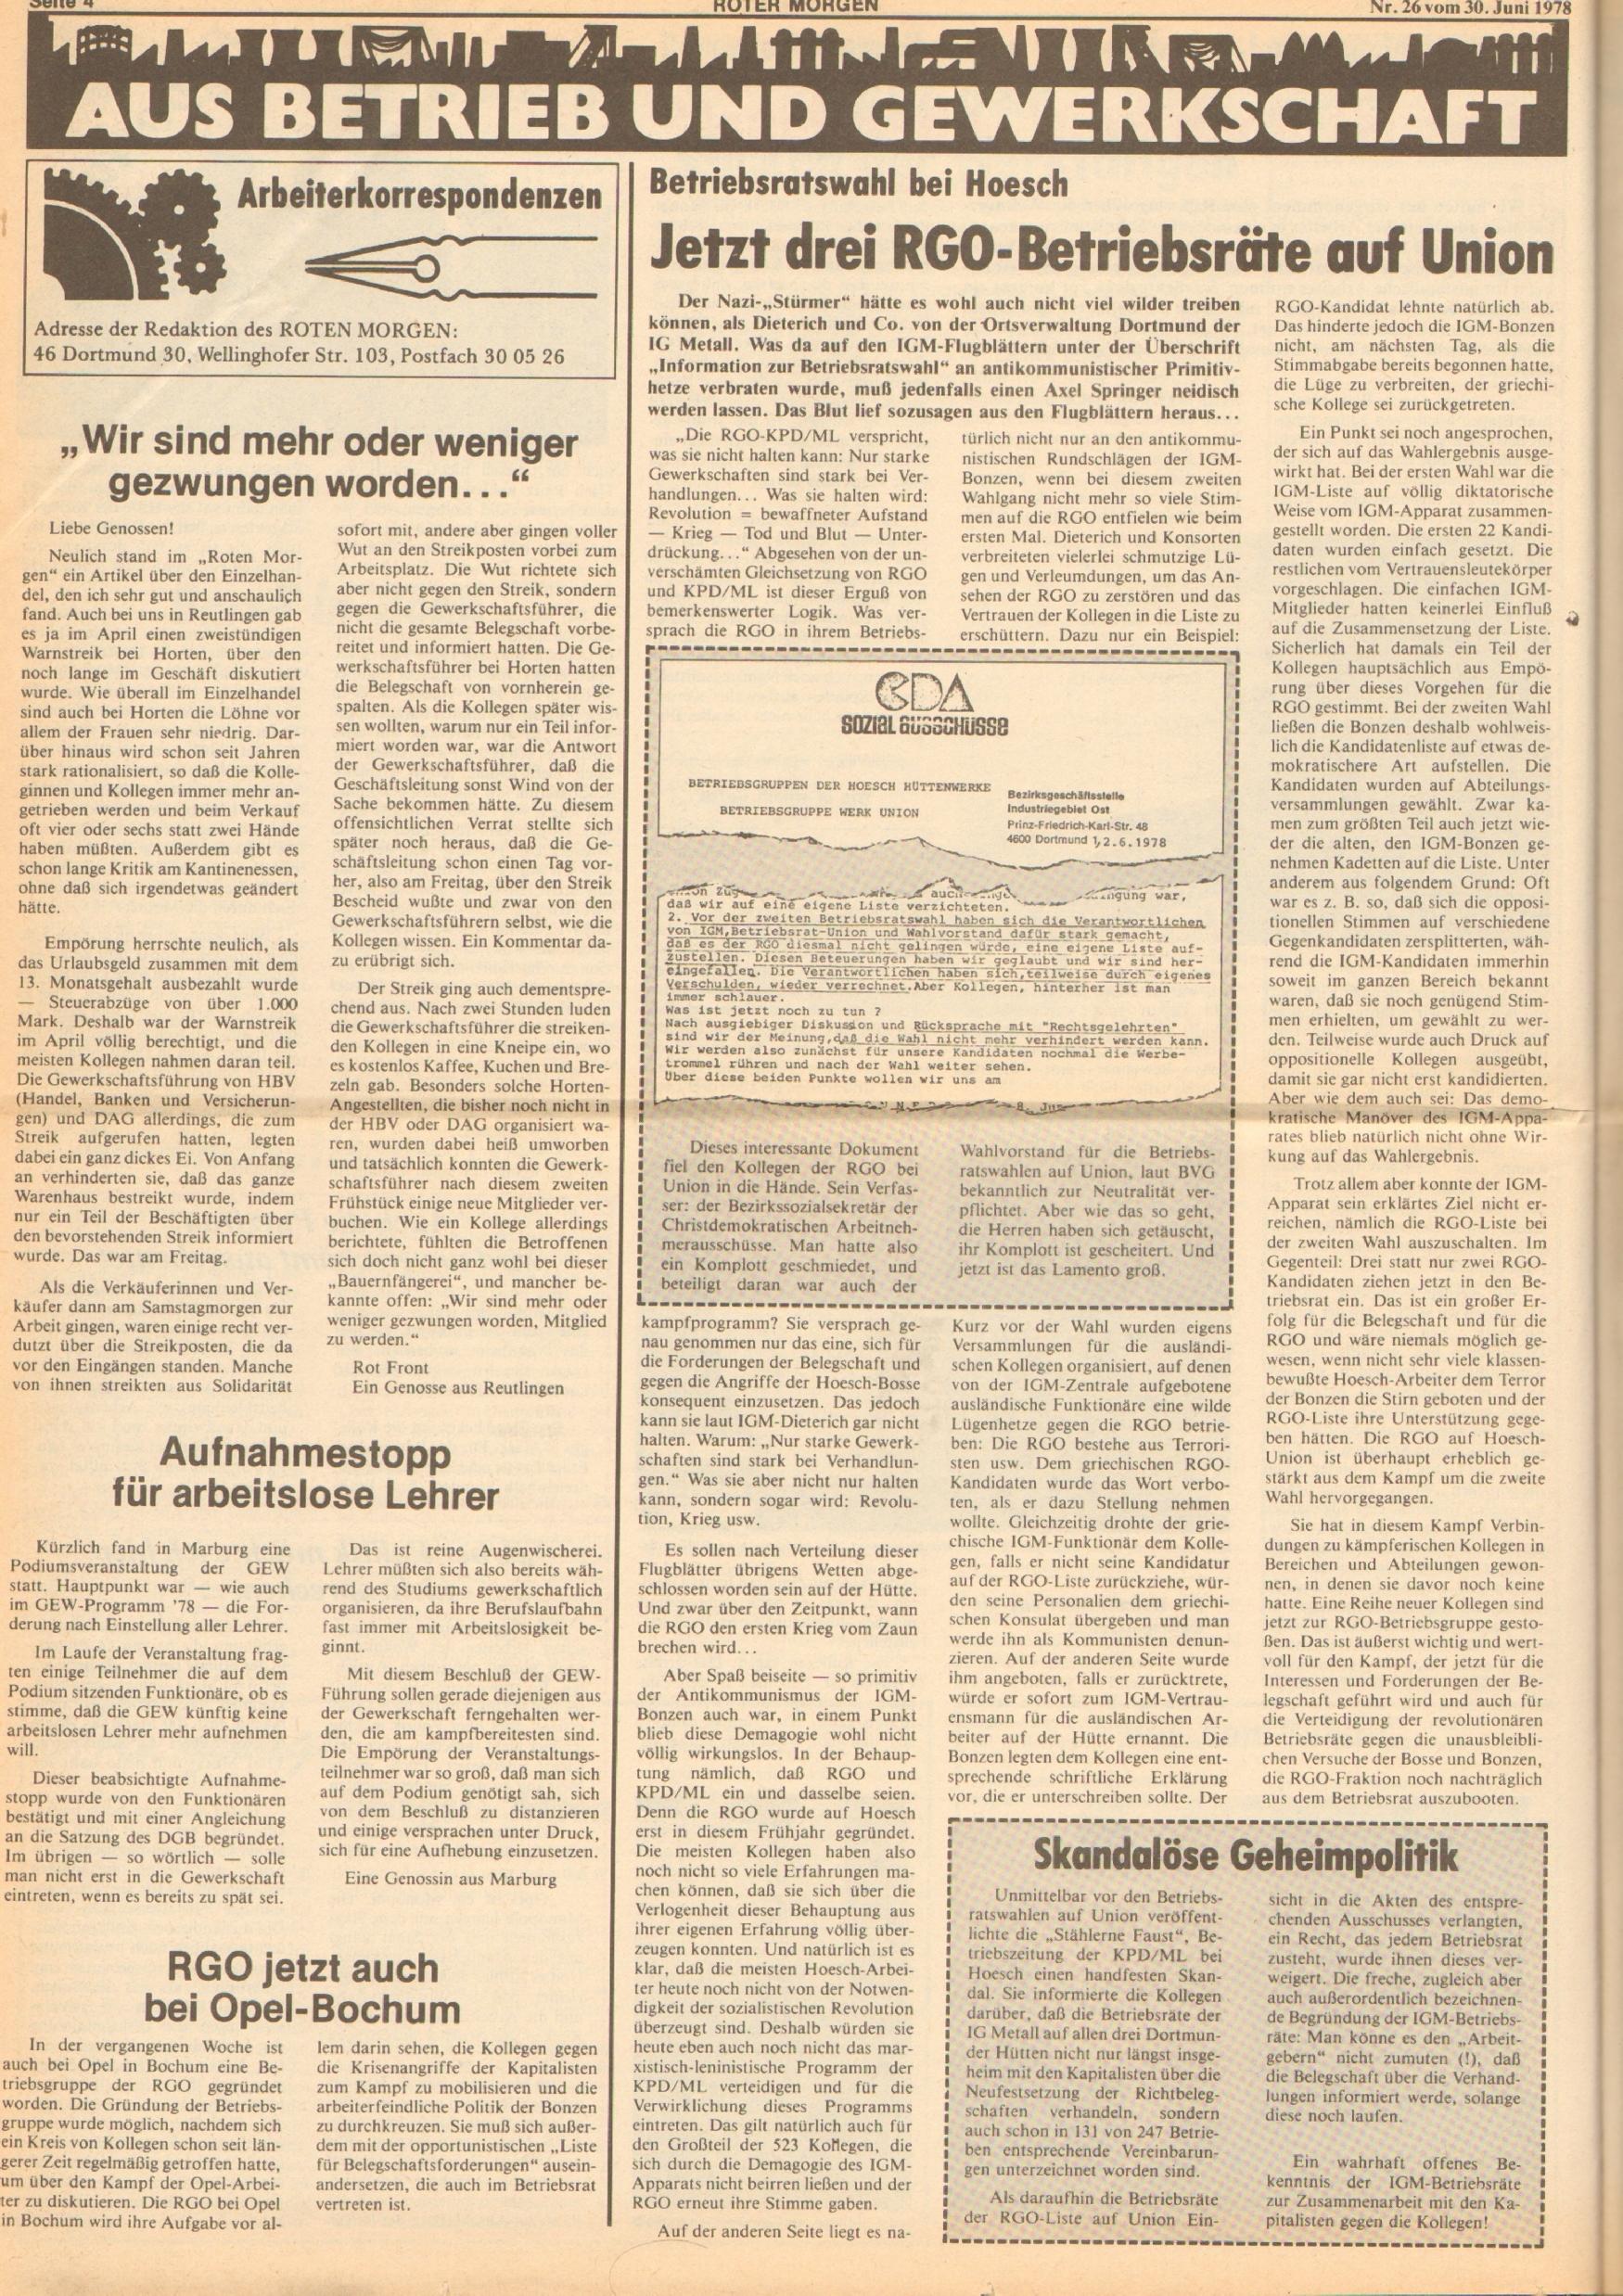 Roter Morgen, 12. Jg., 30. Juni 1978, Nr. 26, Seite 4